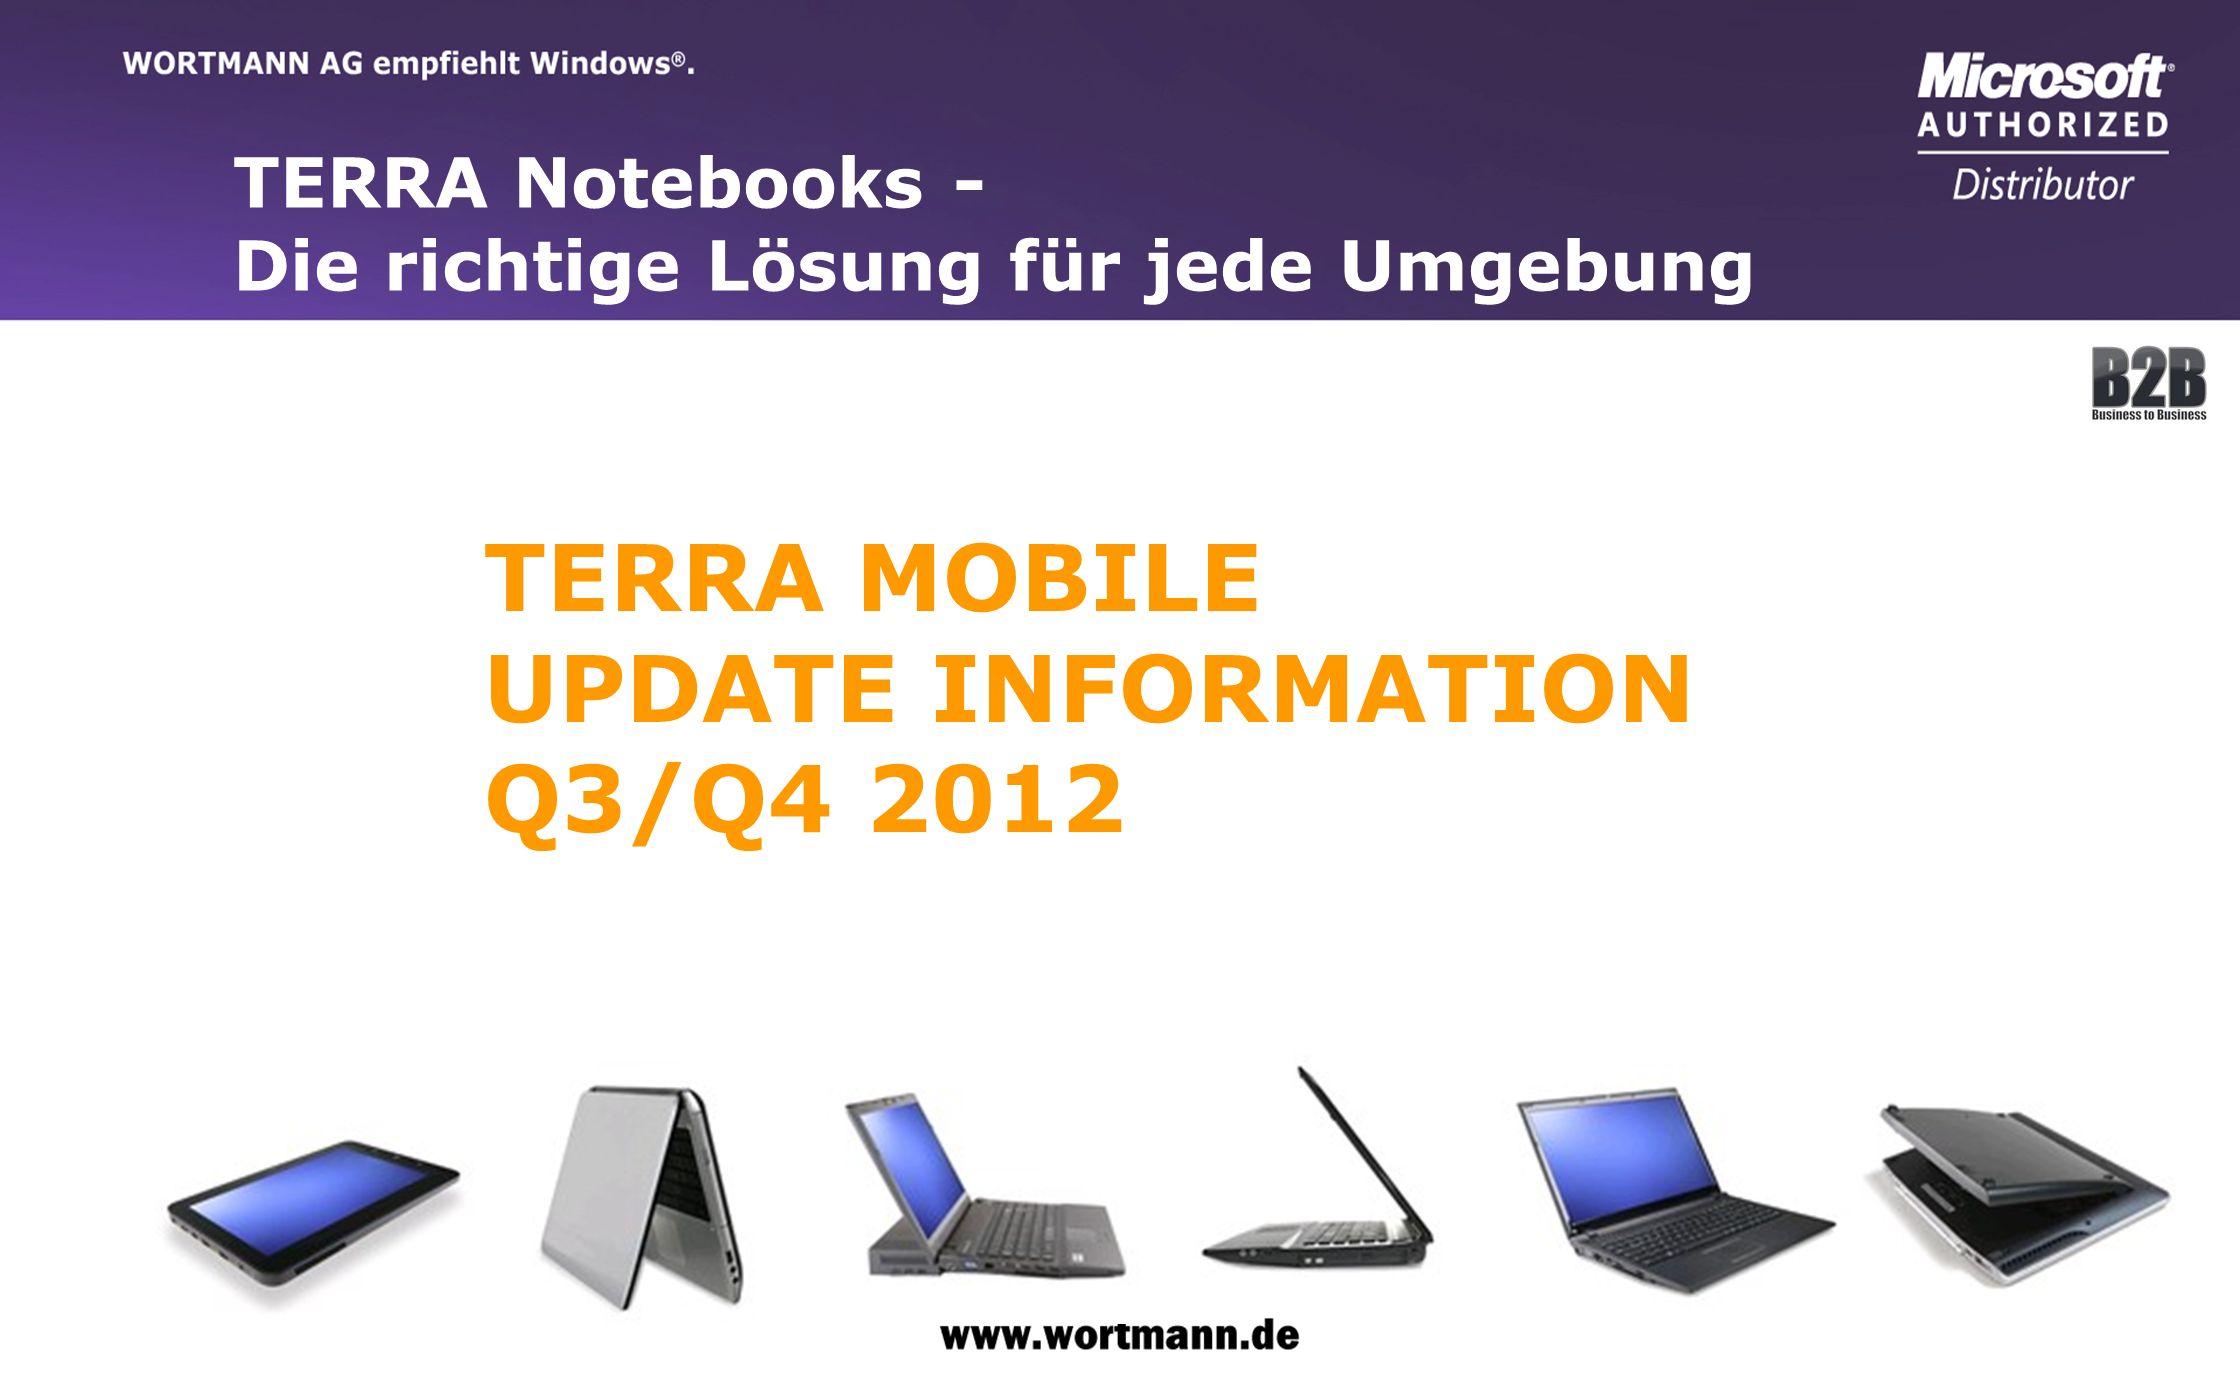 www.wortmann.de TERRA MOBILE ROADMAP Q3-Q4, 2012 Aktuell Neu EOL MOBILE 1586P 15,6 Non Glare,HM65,1GB Geforce 540M,USB3,0 MOBILE 1562P 15,6 Non Glare,HM65,USB 3,0 Sep.